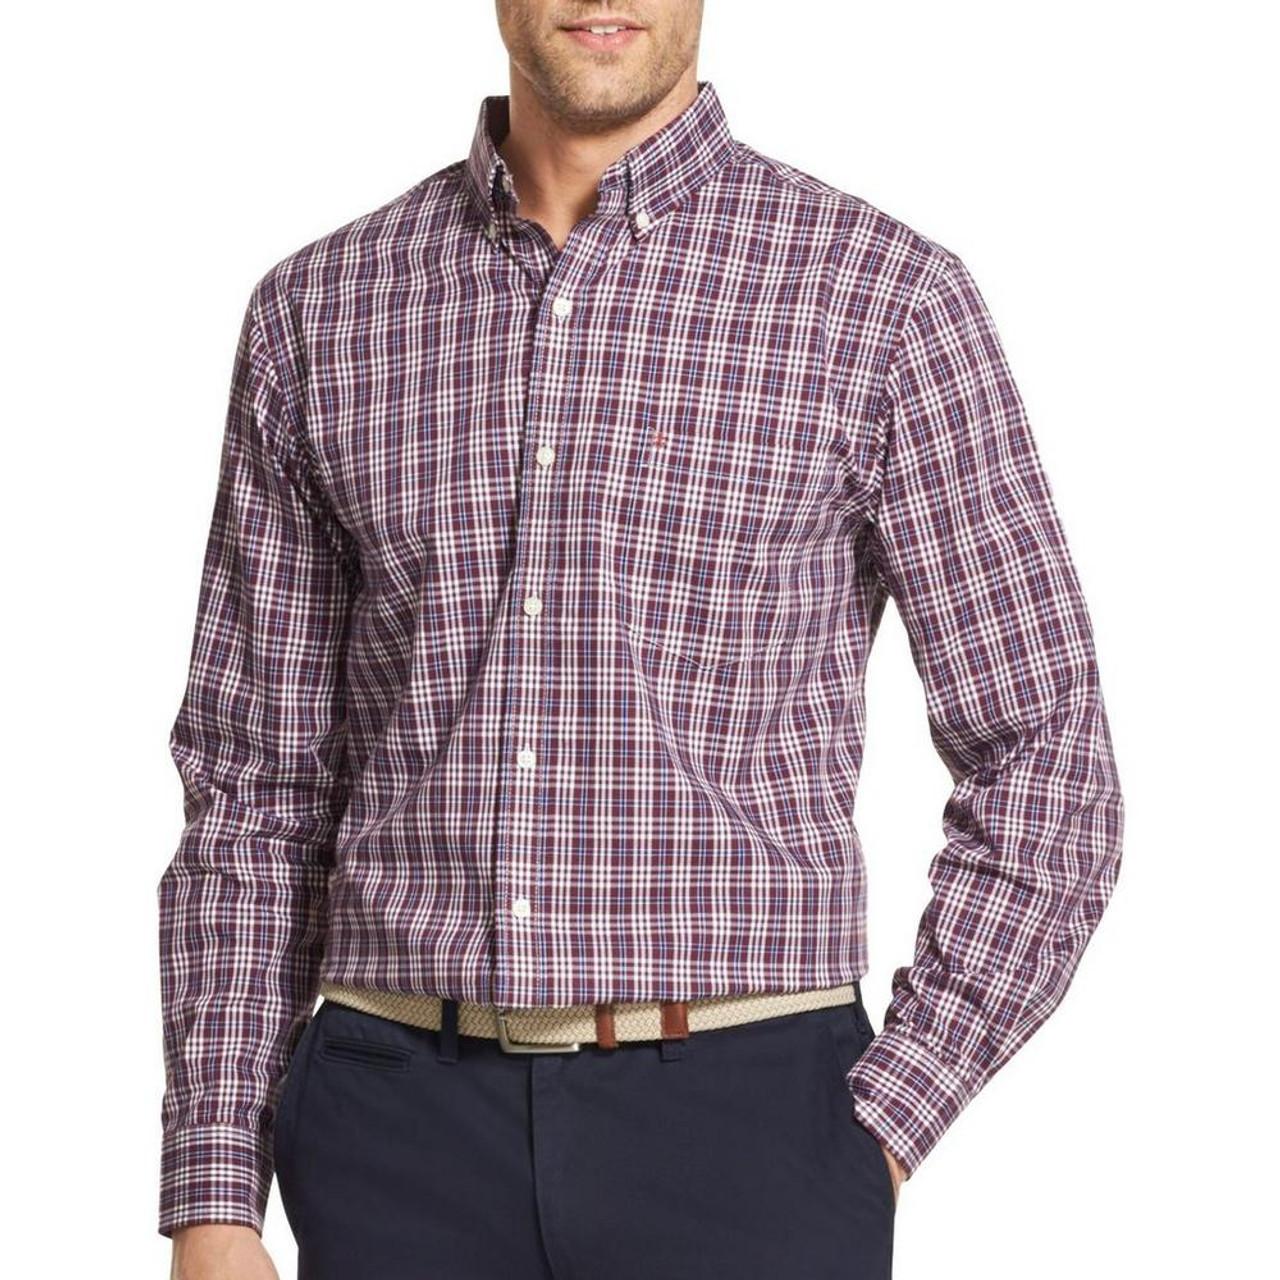 Izod Mens Premium Essentials Checkered Plaid Button Up Shirt45gw004